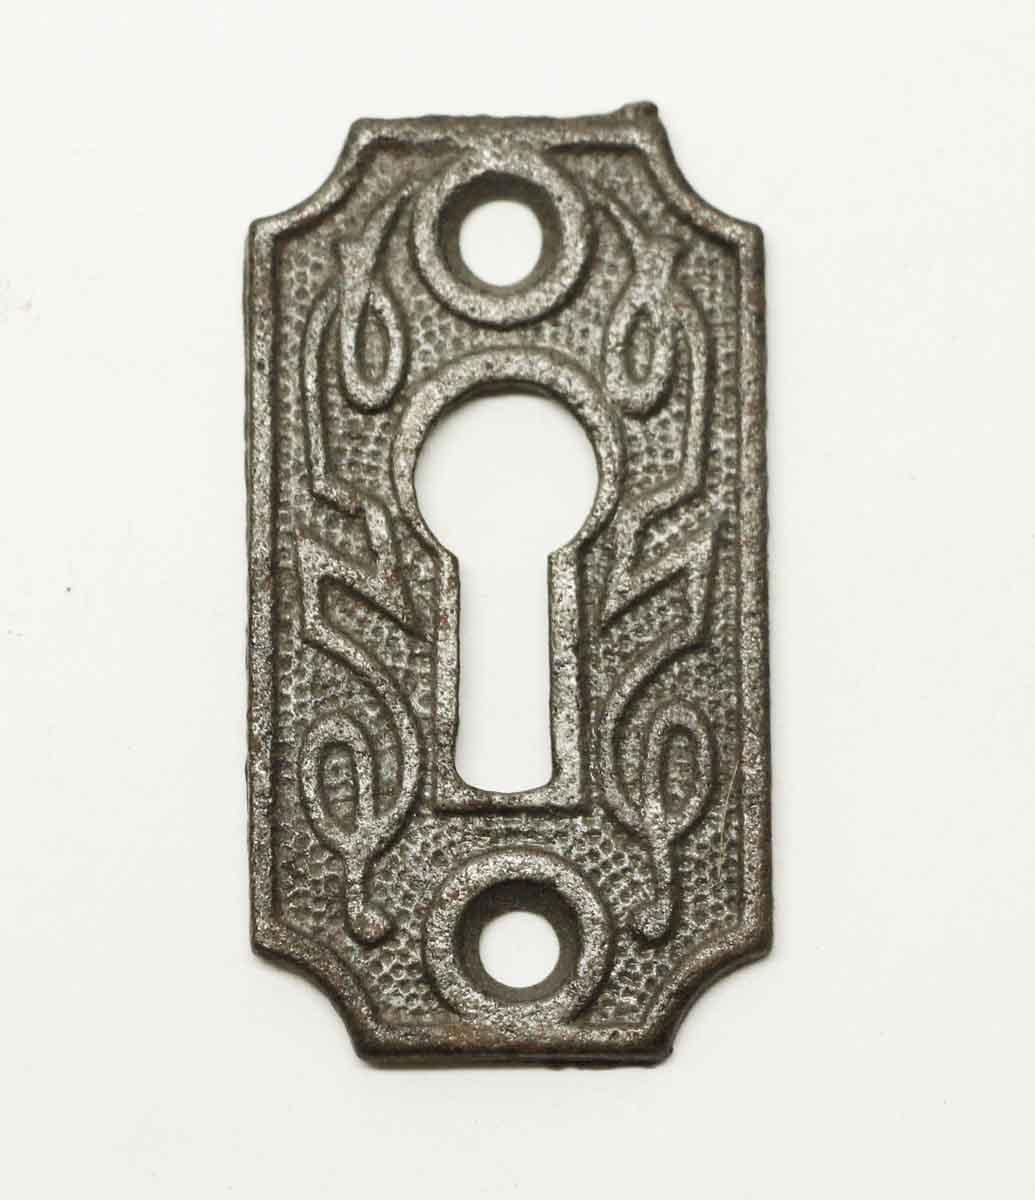 Antique Escutcheon Keyhole Brass Vintage Door Hardware Victorian £10 Each